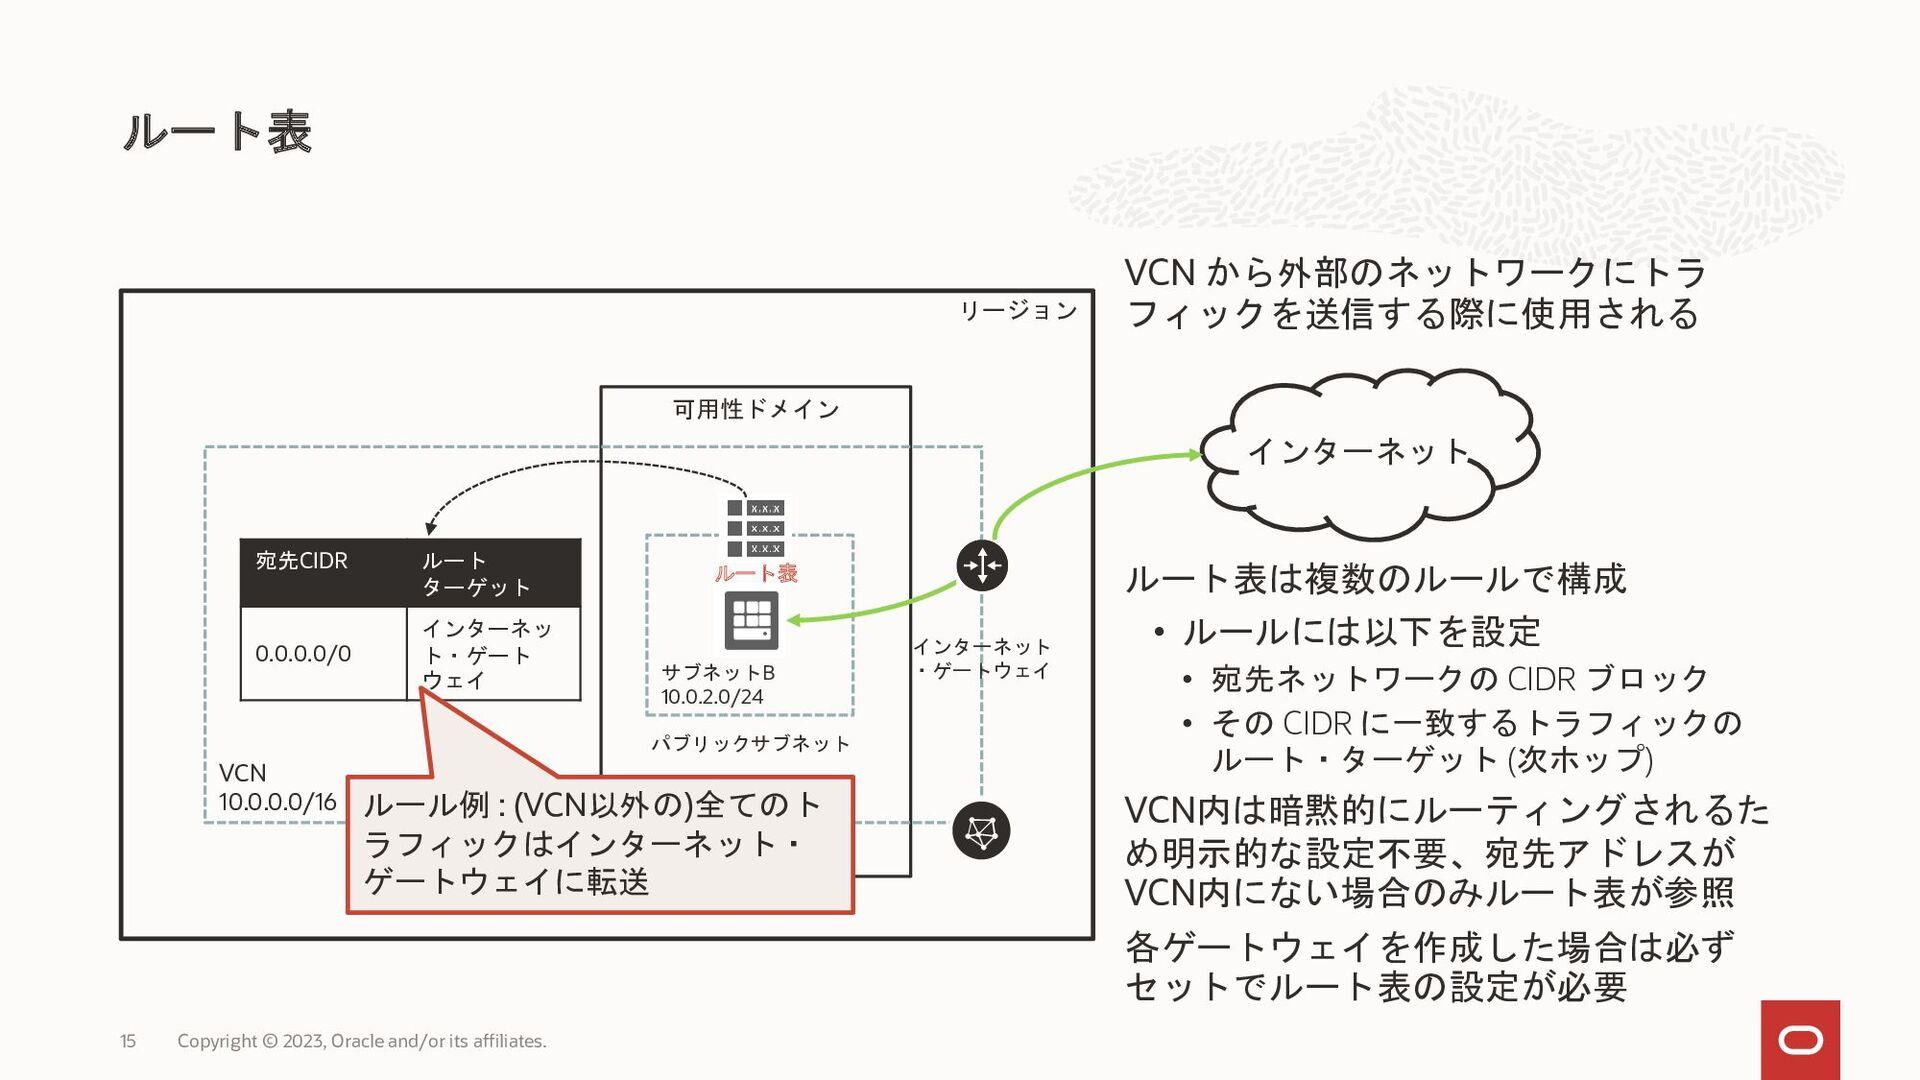 VCN 10.0.0.0/16 B 10.0.2.0/24 VCN VCN 1 ( ) VCN...